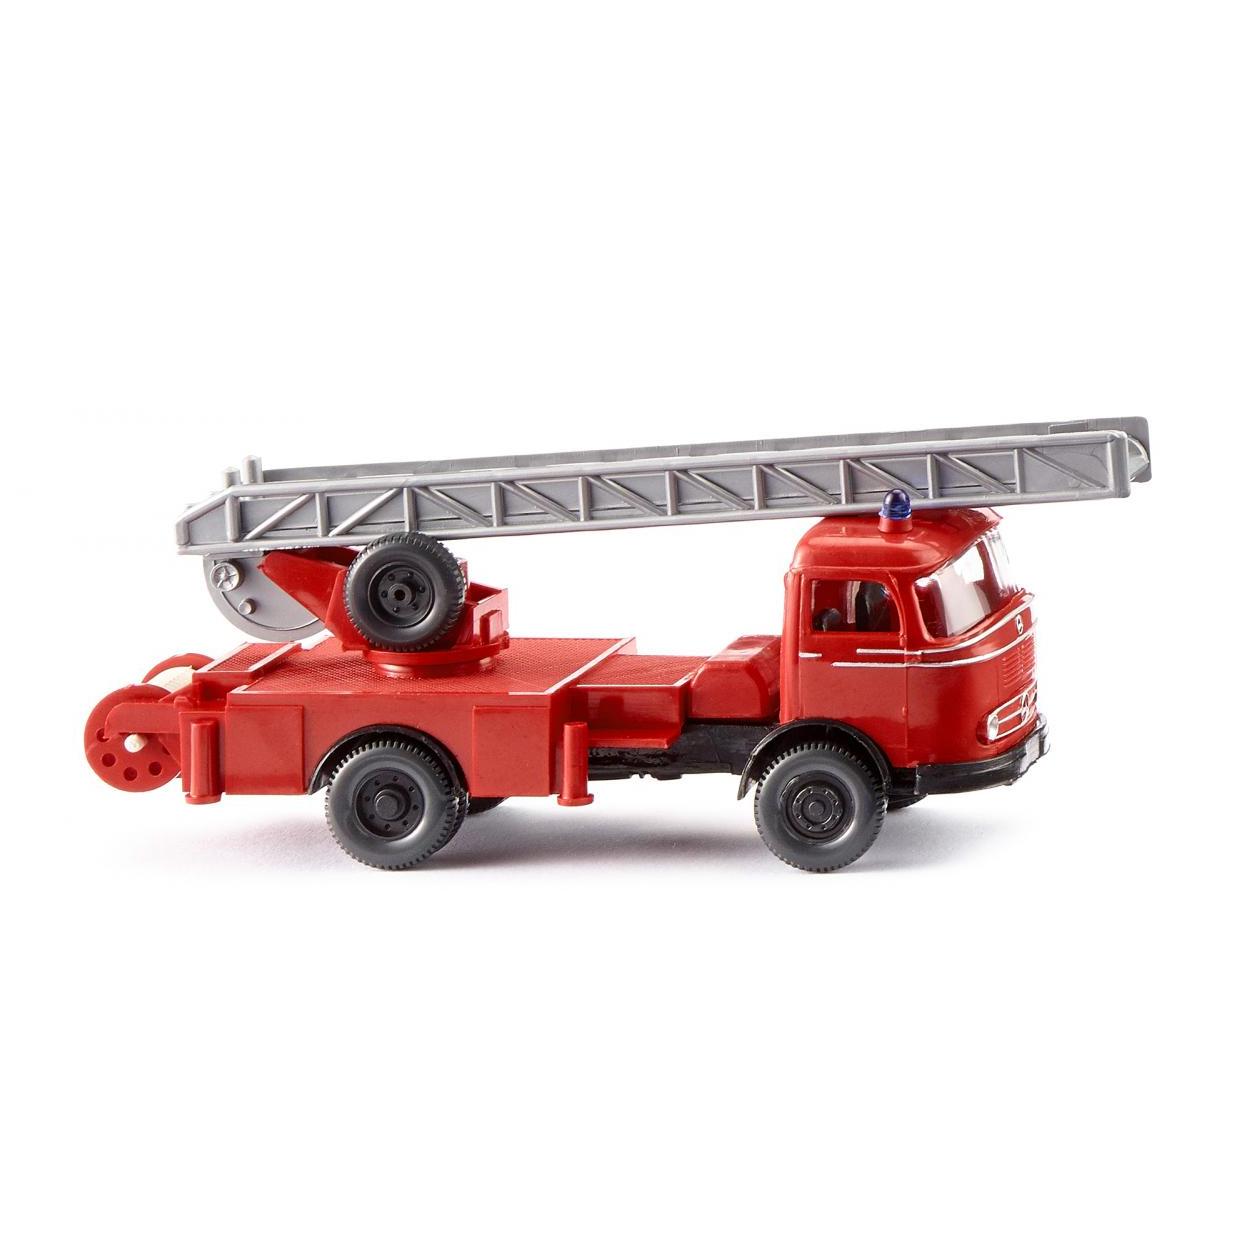 WIKING/ヴィーキング MB 回転はしご消防車